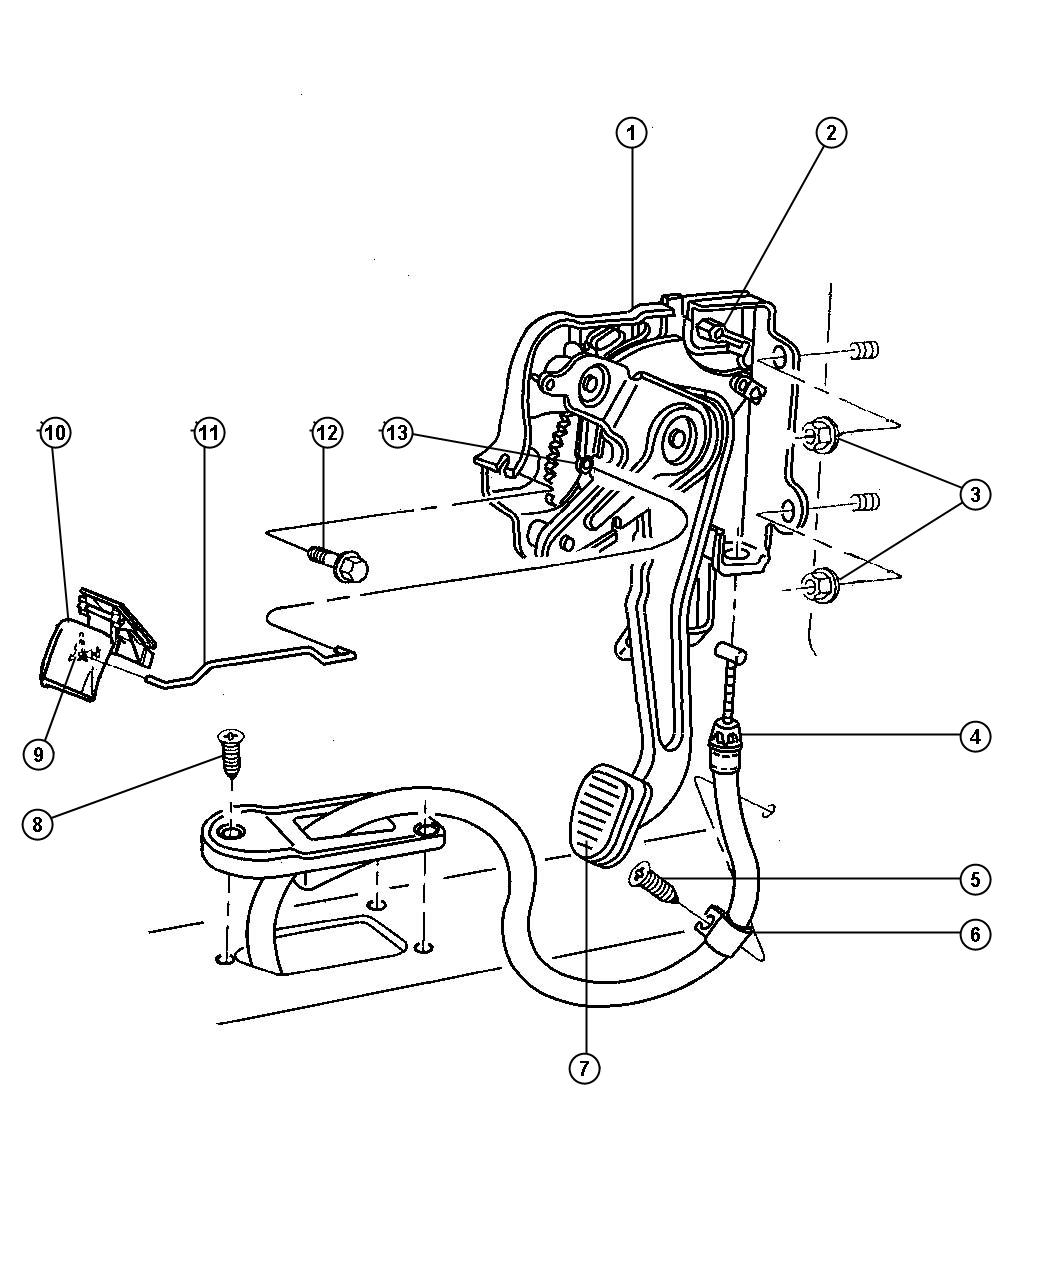 1999 Dodge Ram 1500 Cable. Parking brake. Front. Steering